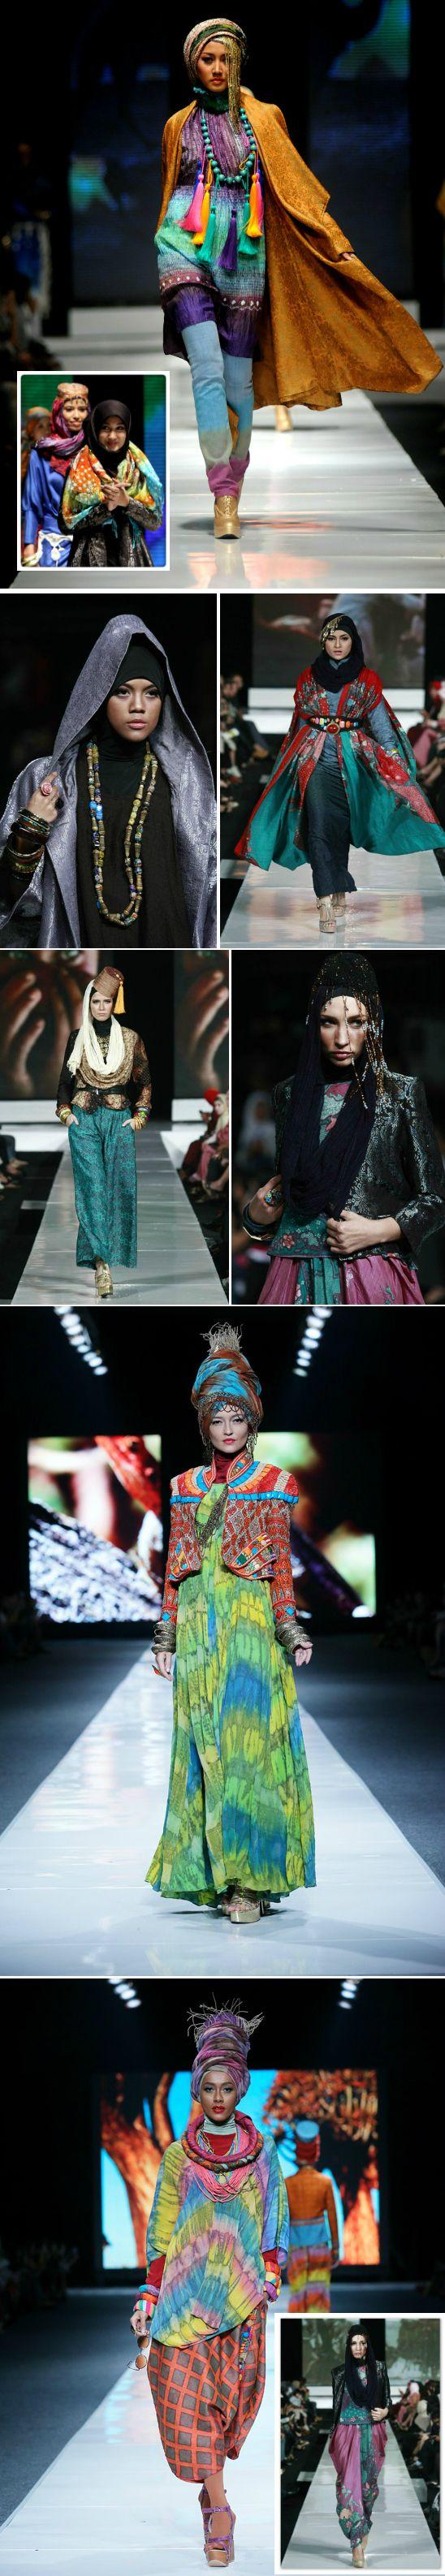 Earth ✵Wheel ✵ Sky✵ Caravan: Fashion Crush of the Day: Dian Pelangi {Indonesia}